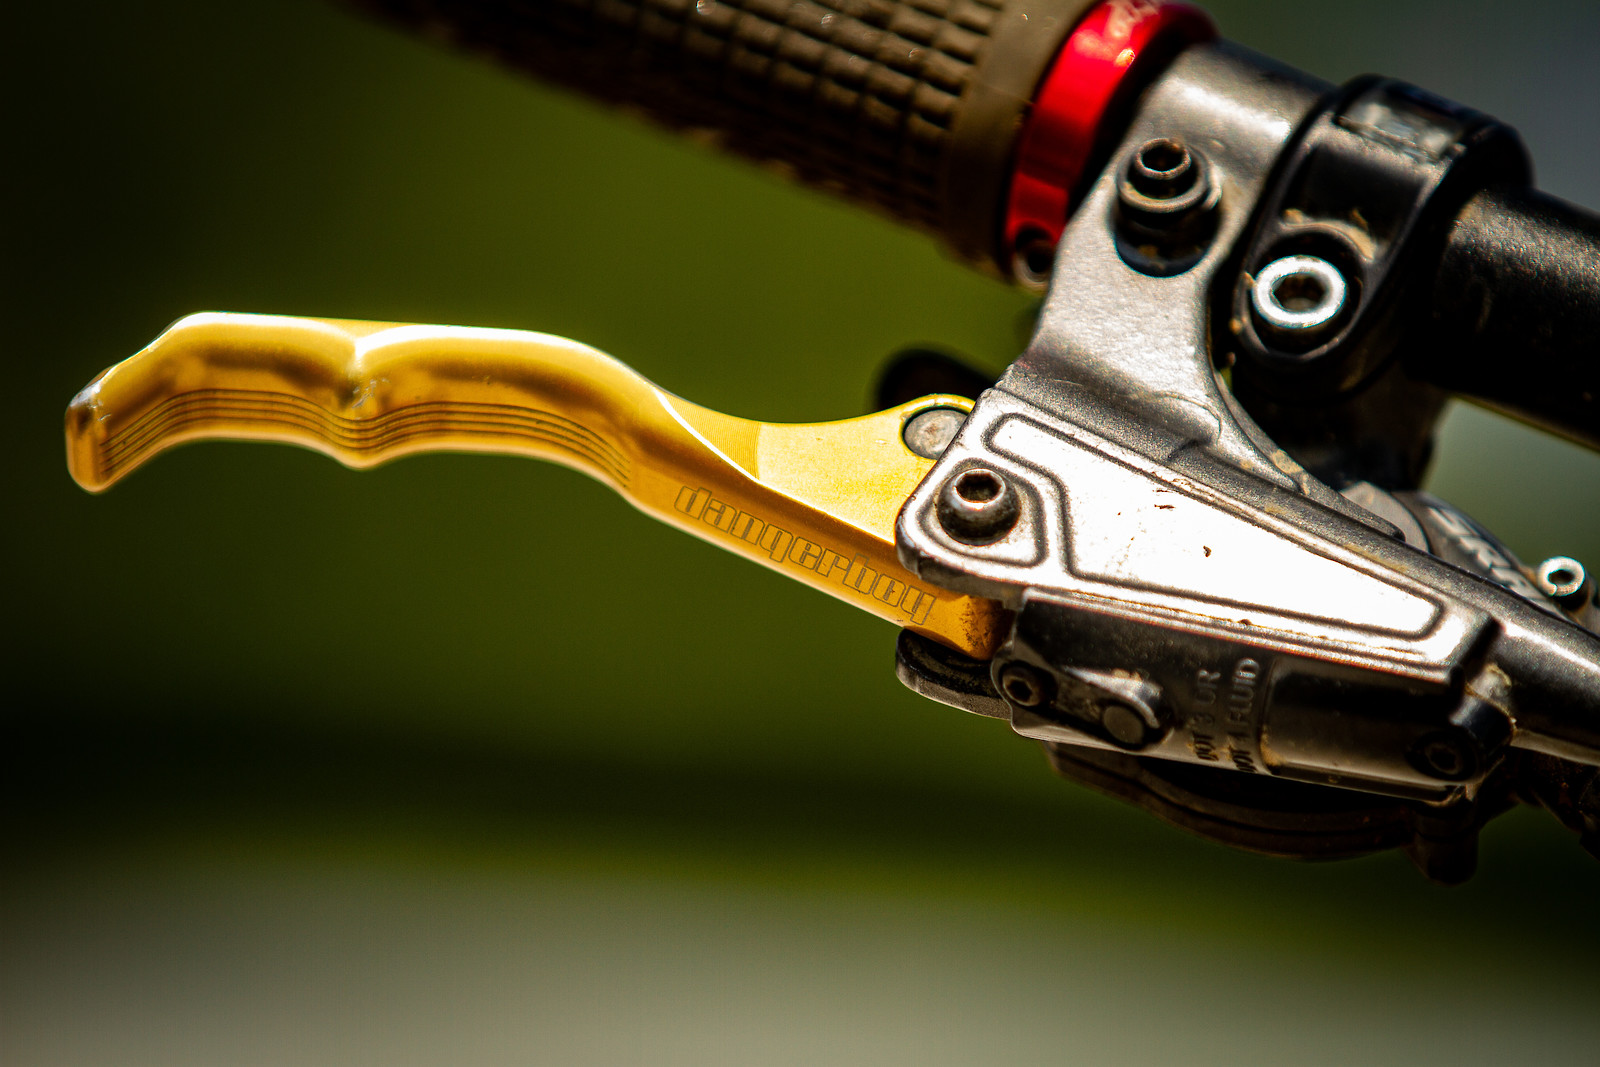 Dangerboy Brake Levers! - JackRice - Mountain Biking Pictures - Vital MTB